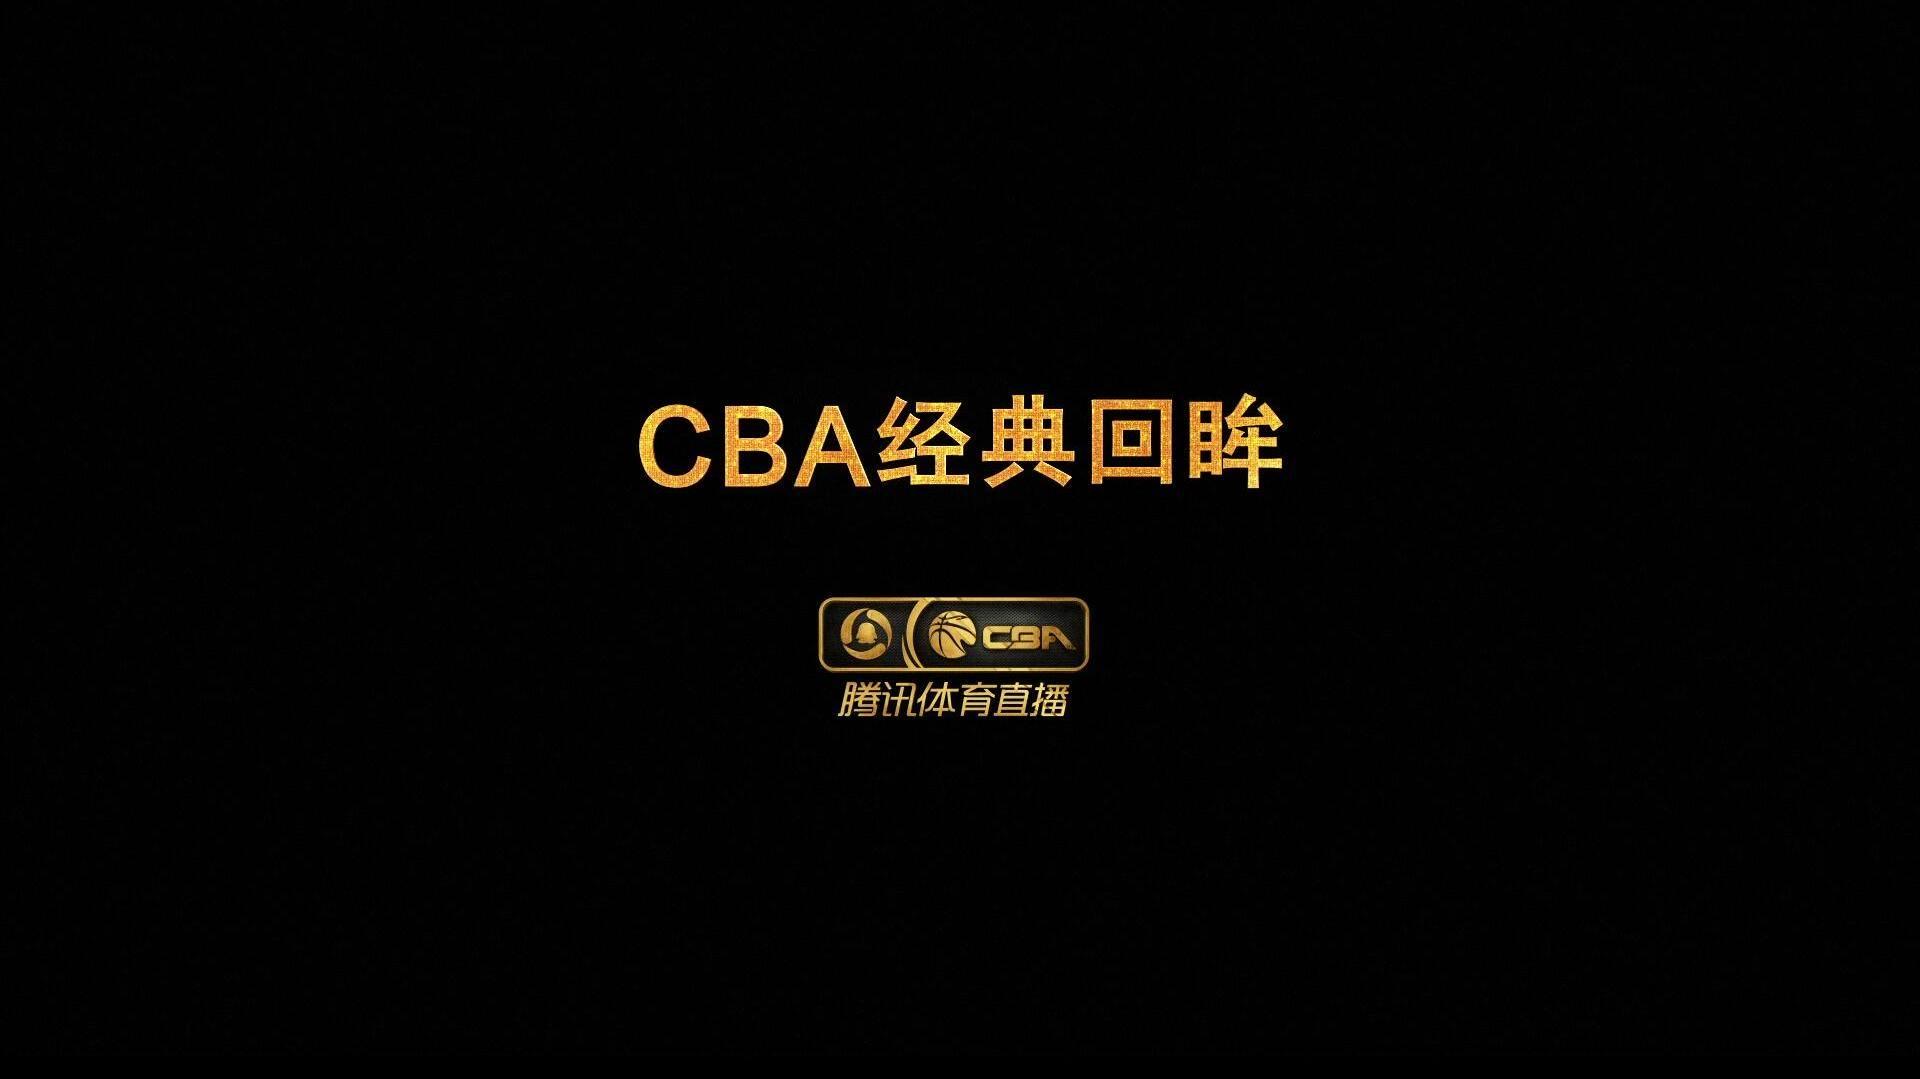 《CBA经典回眸》第三期  单场53分! 昆西杜比打破总决赛单场得分纪录